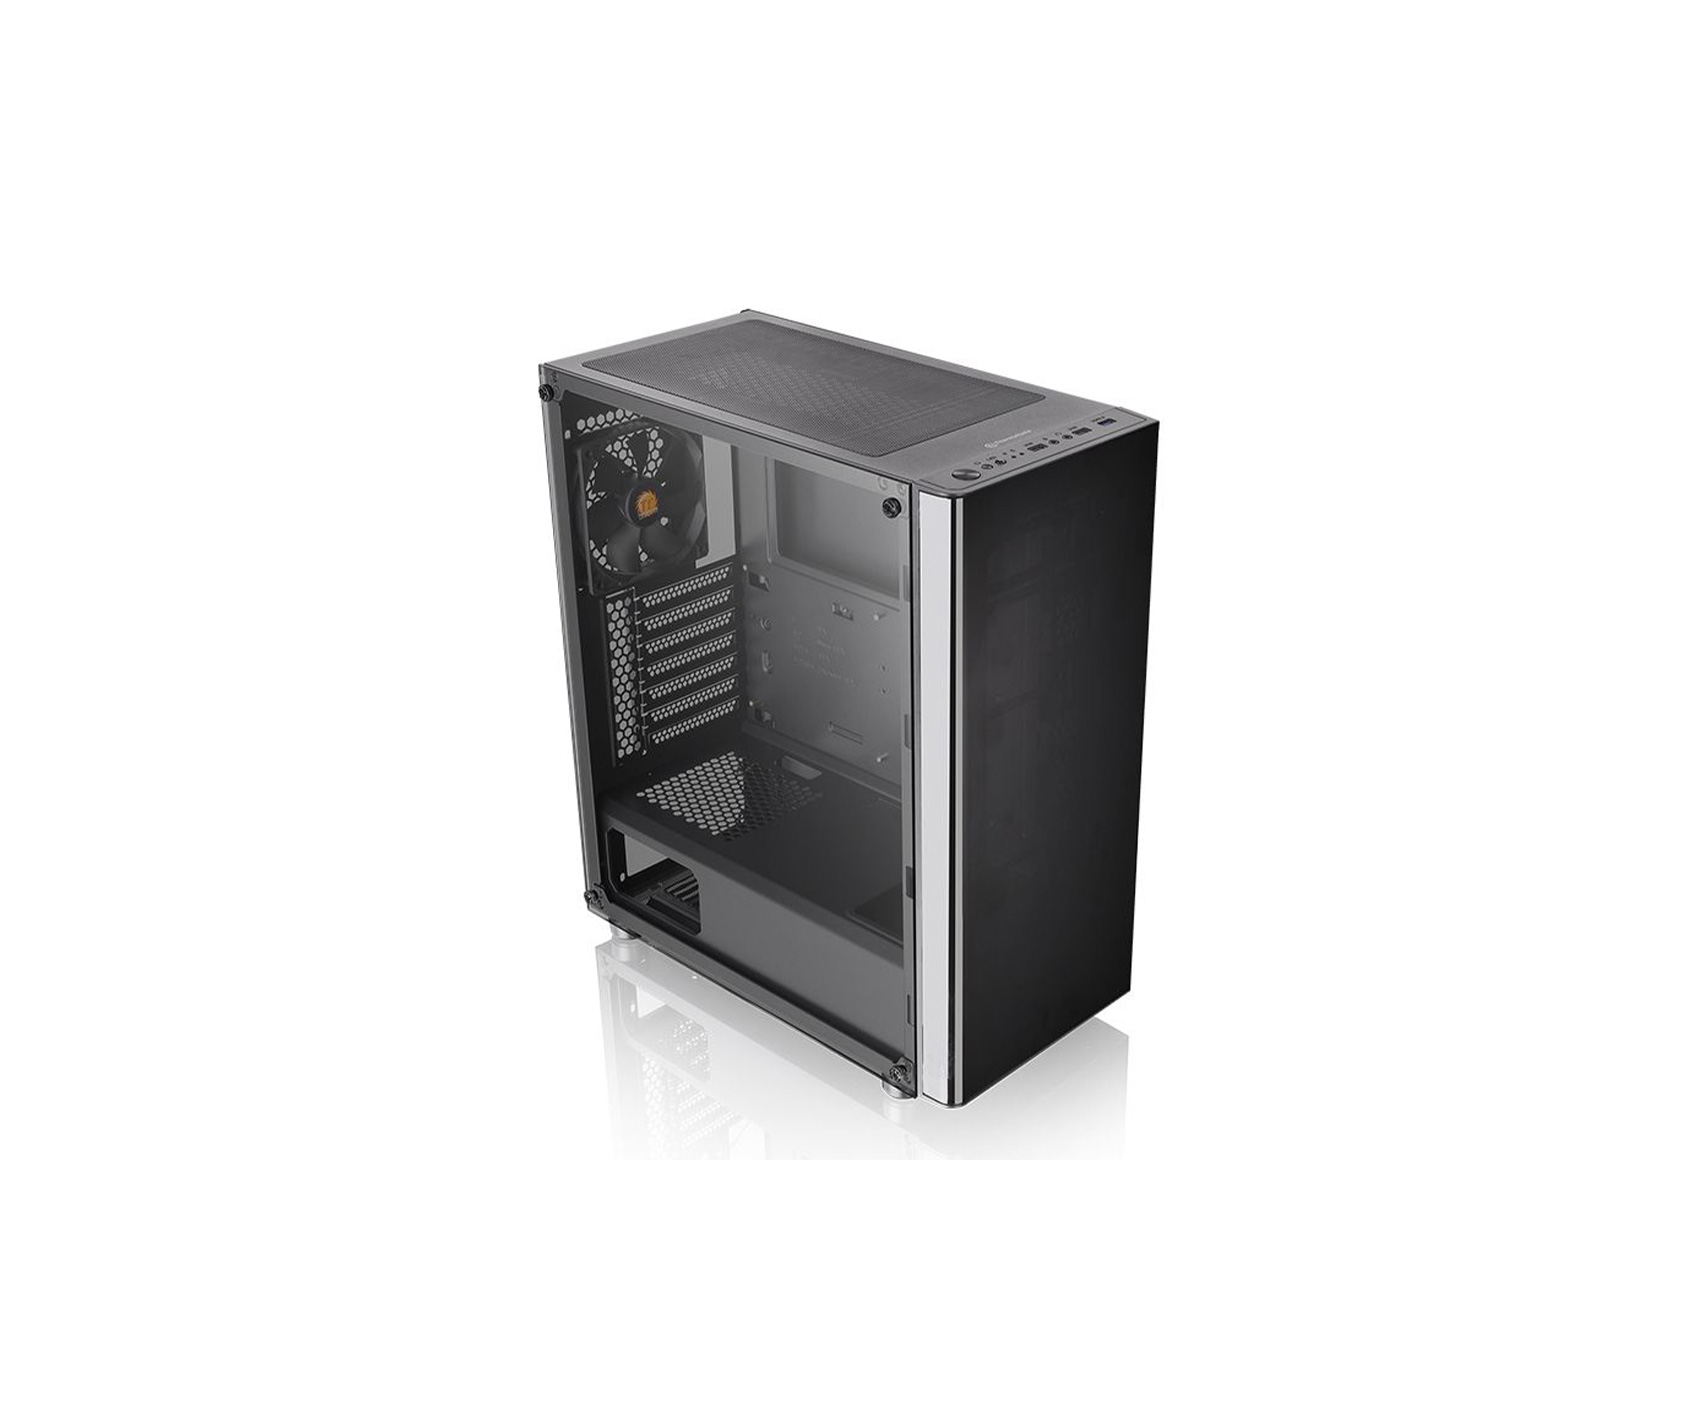 CASE THERMALTAKE V200 TG with 600W PSU